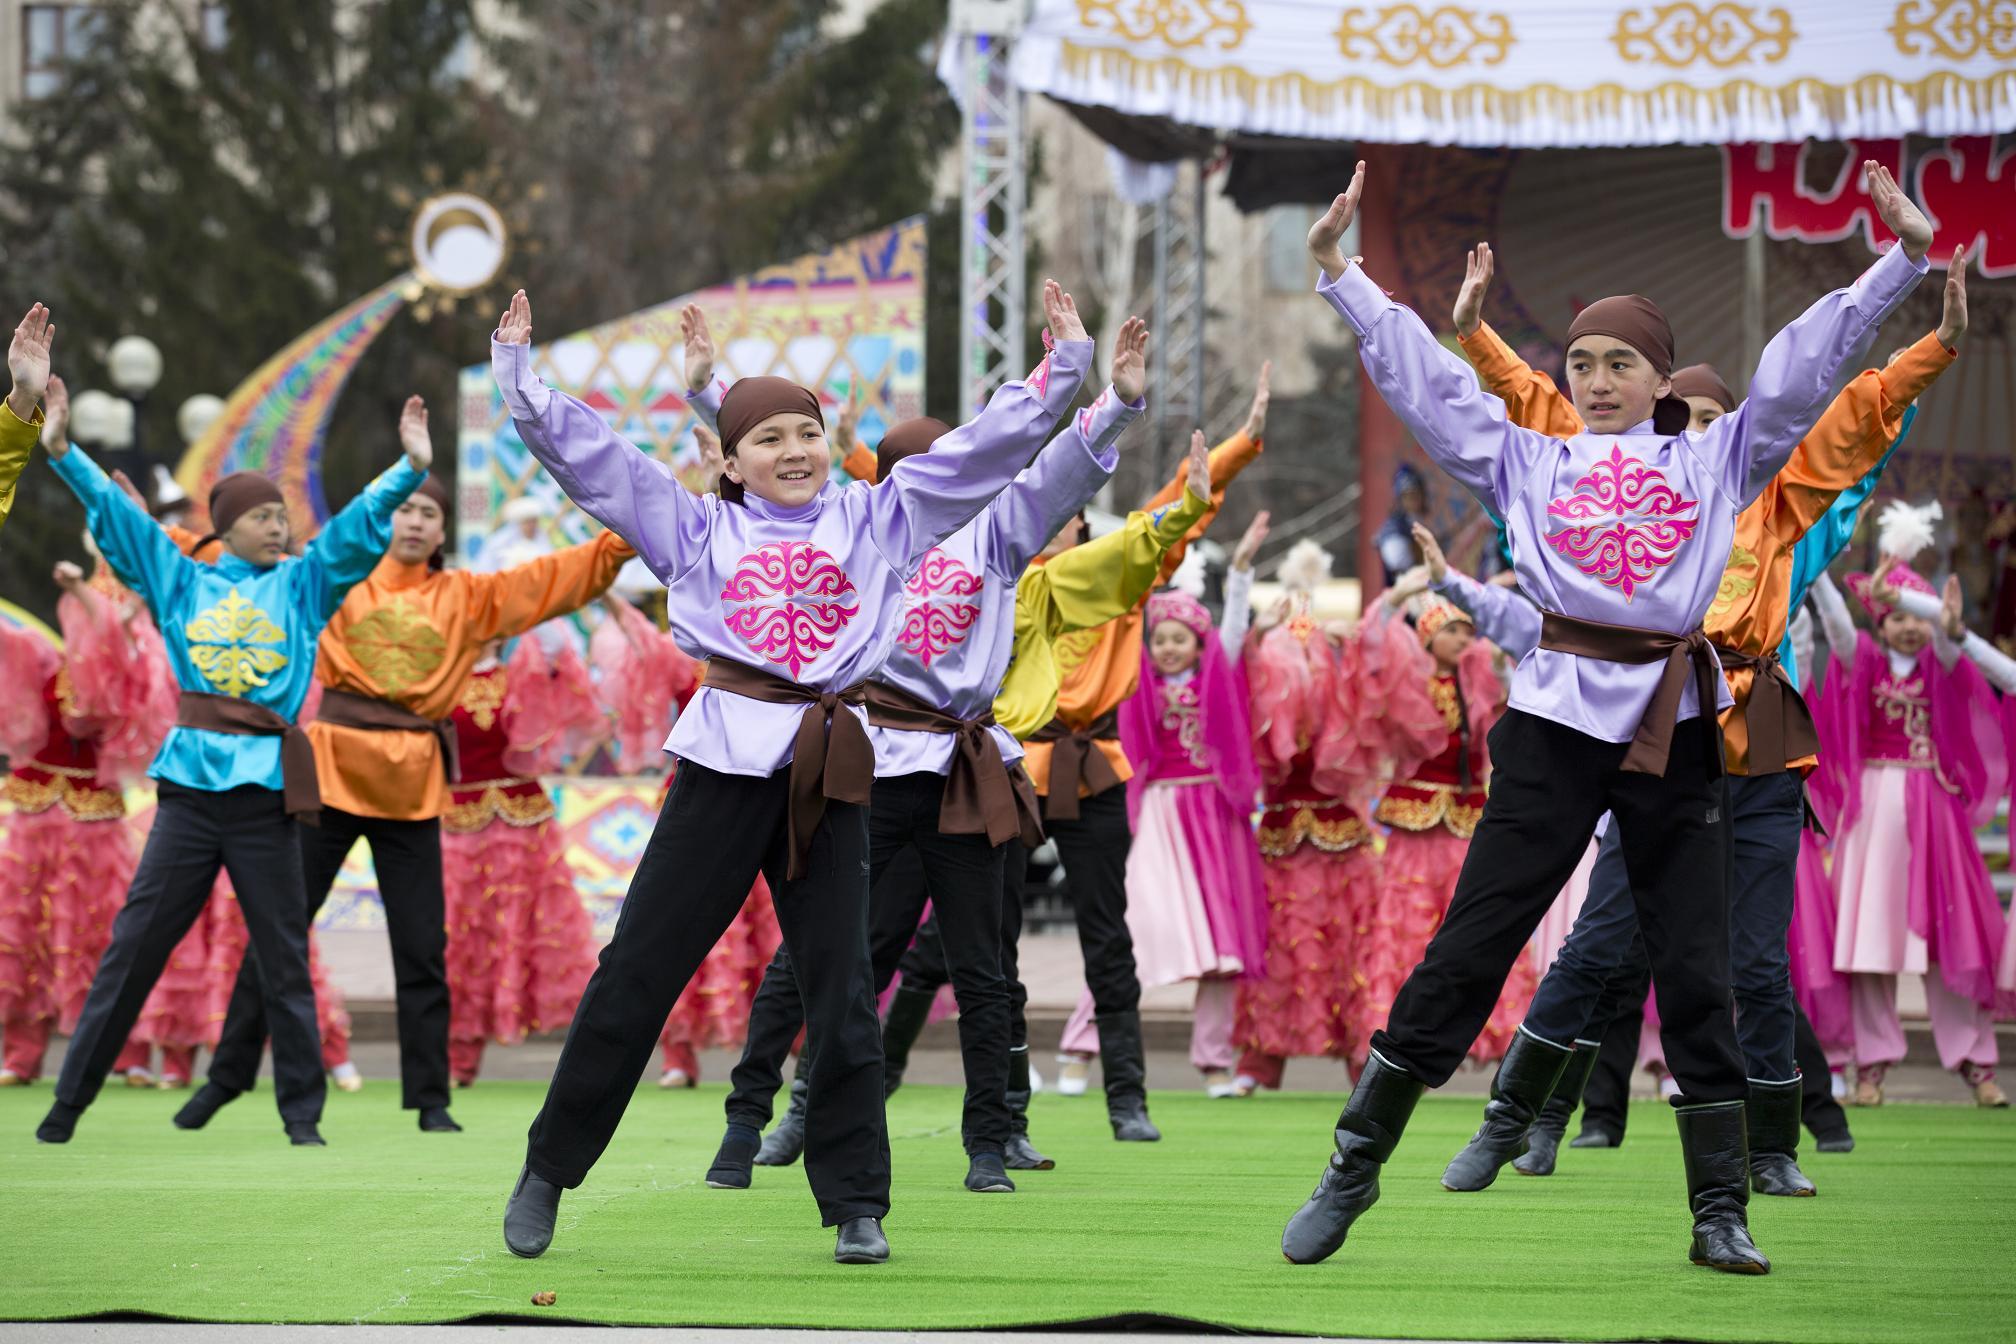 Kazakhstan Celebrates Nauryz The Astana Times